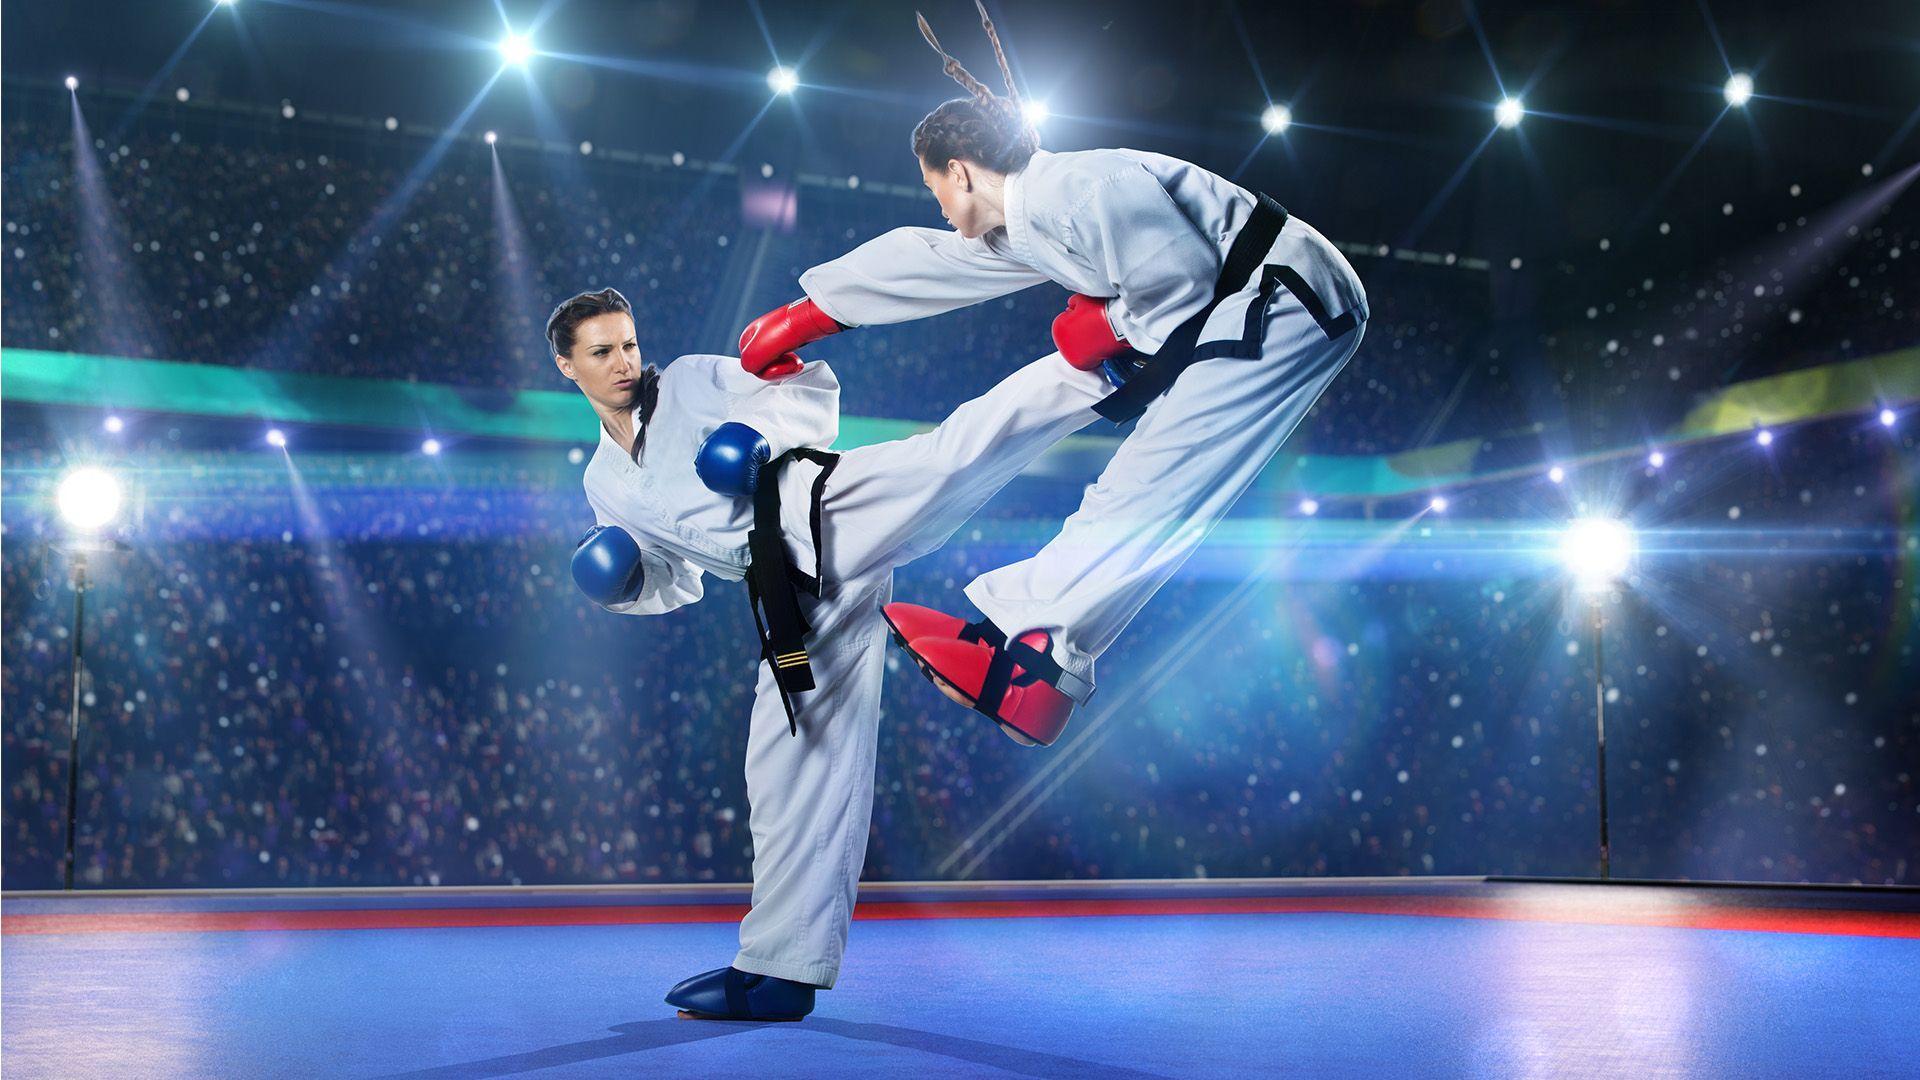 Itf Taekwondo Wallpapers - Wallpaper Cave